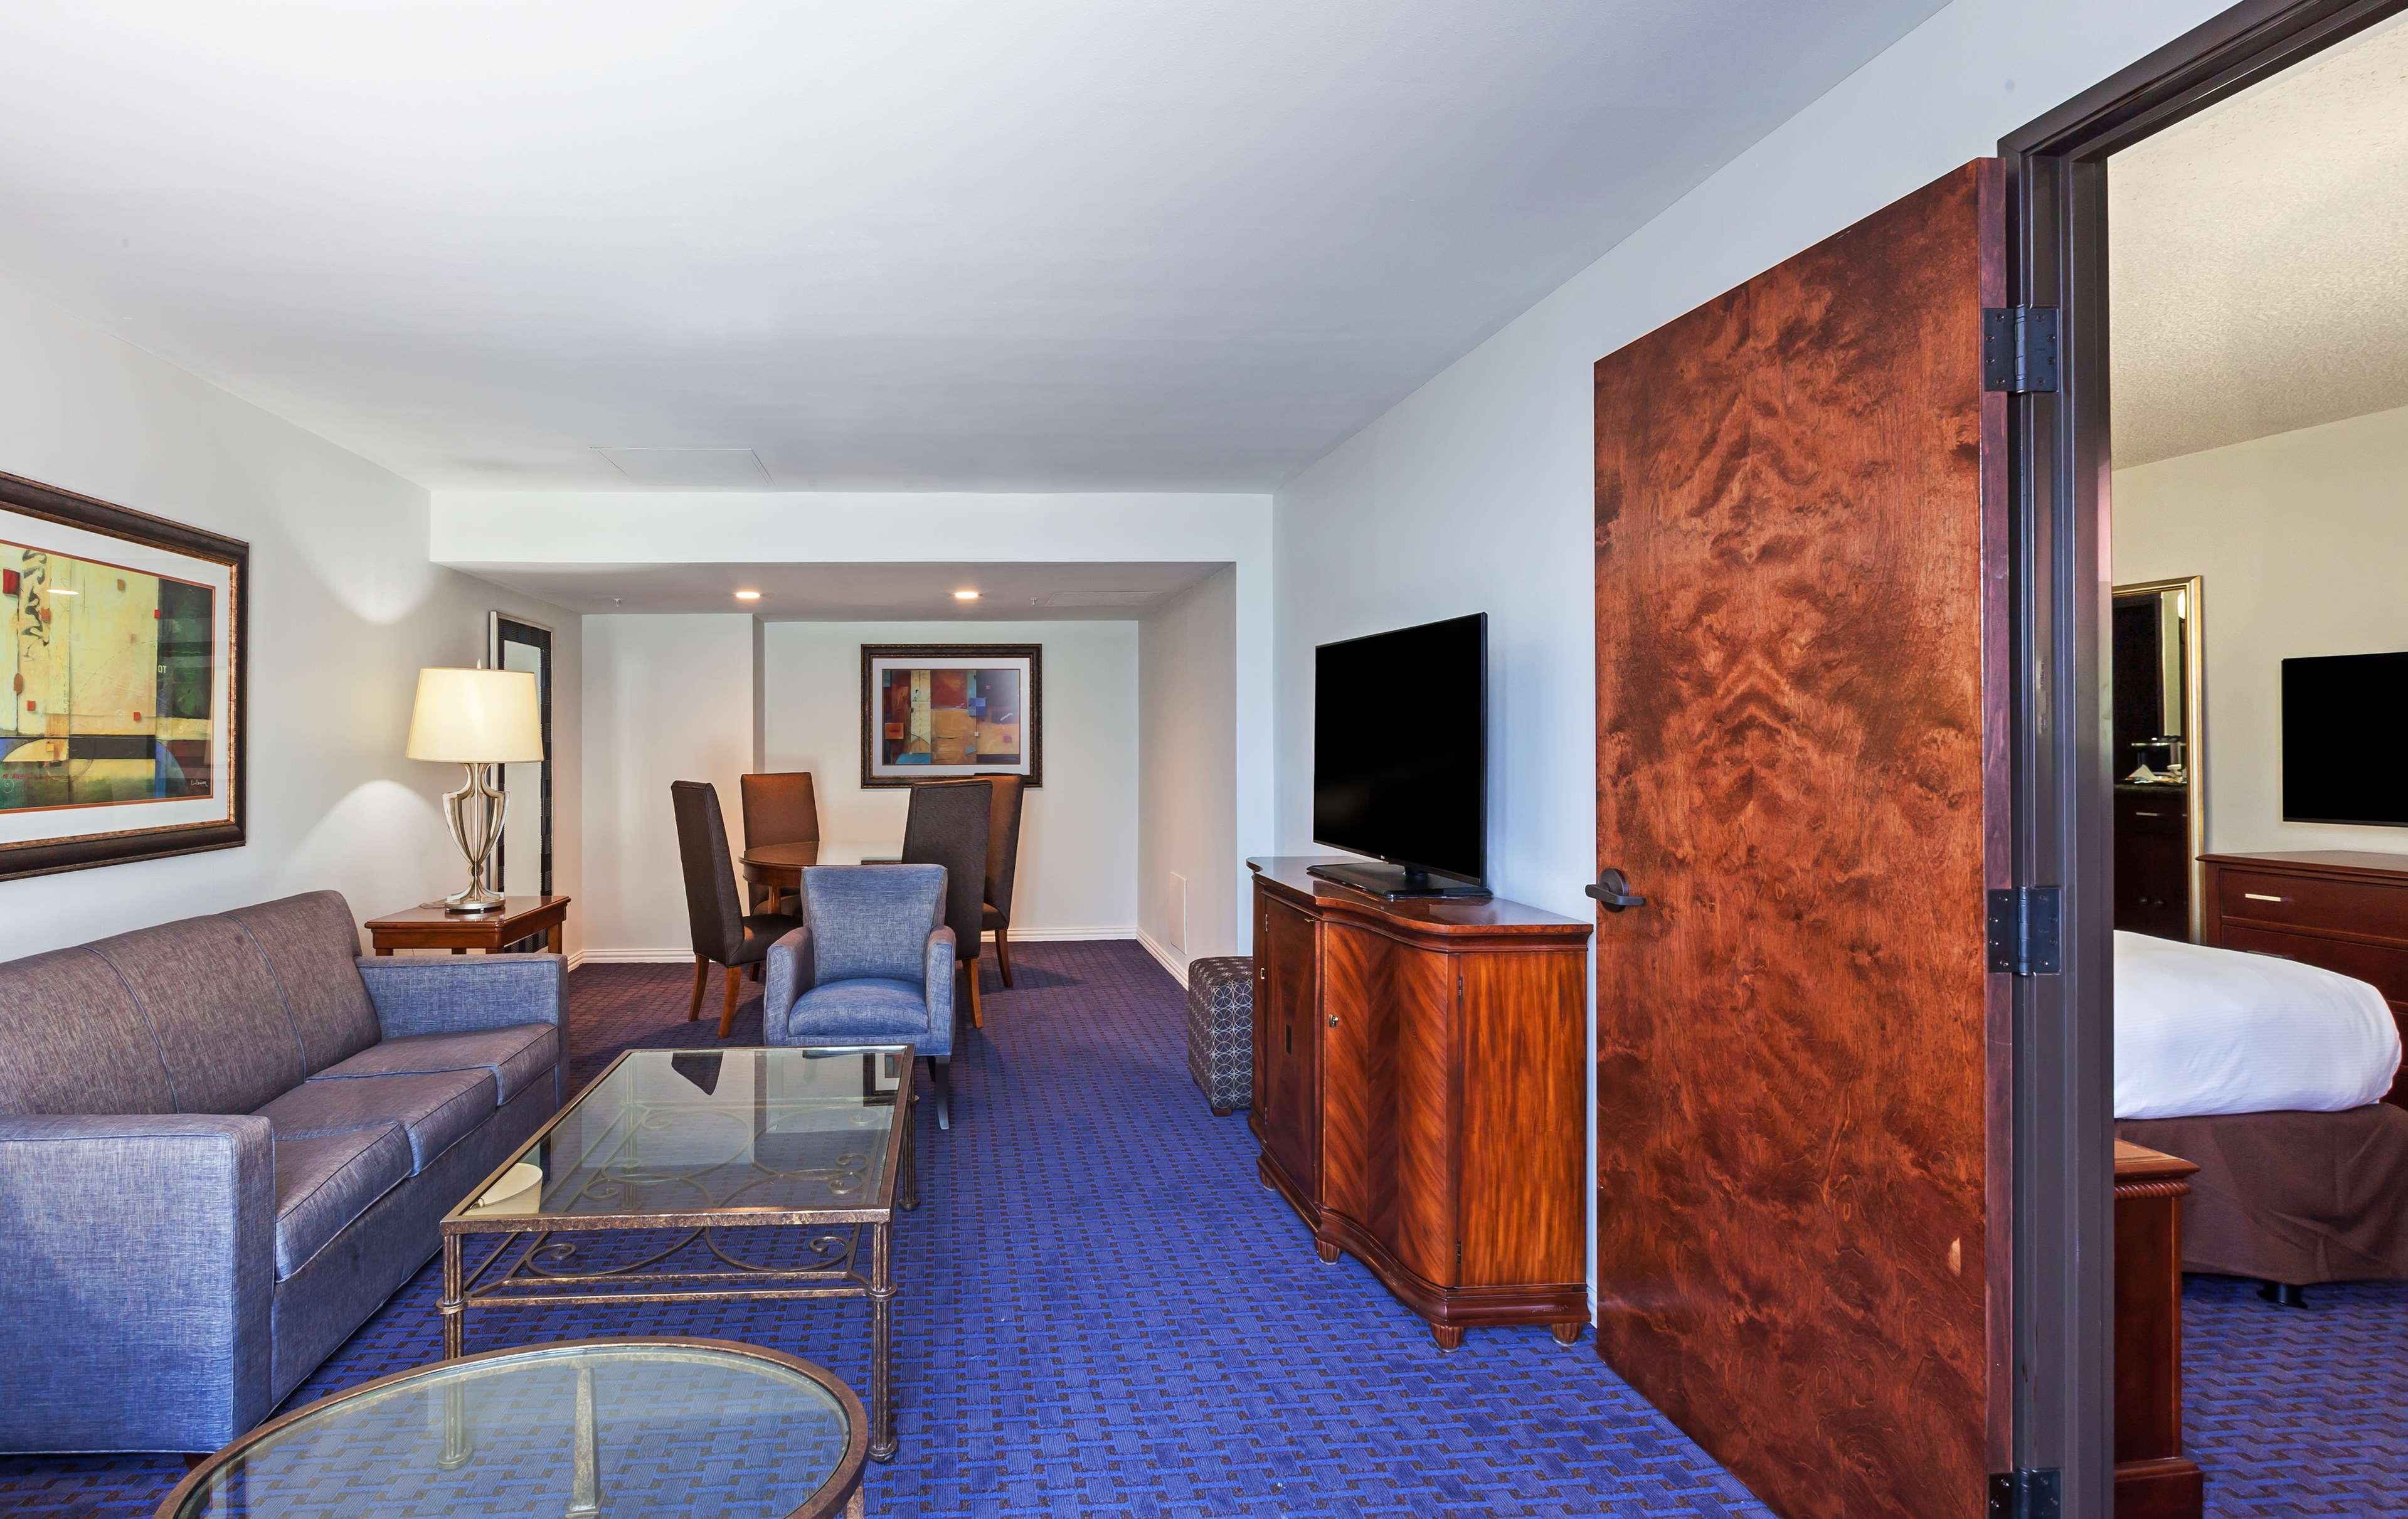 Hilton Waco image 44